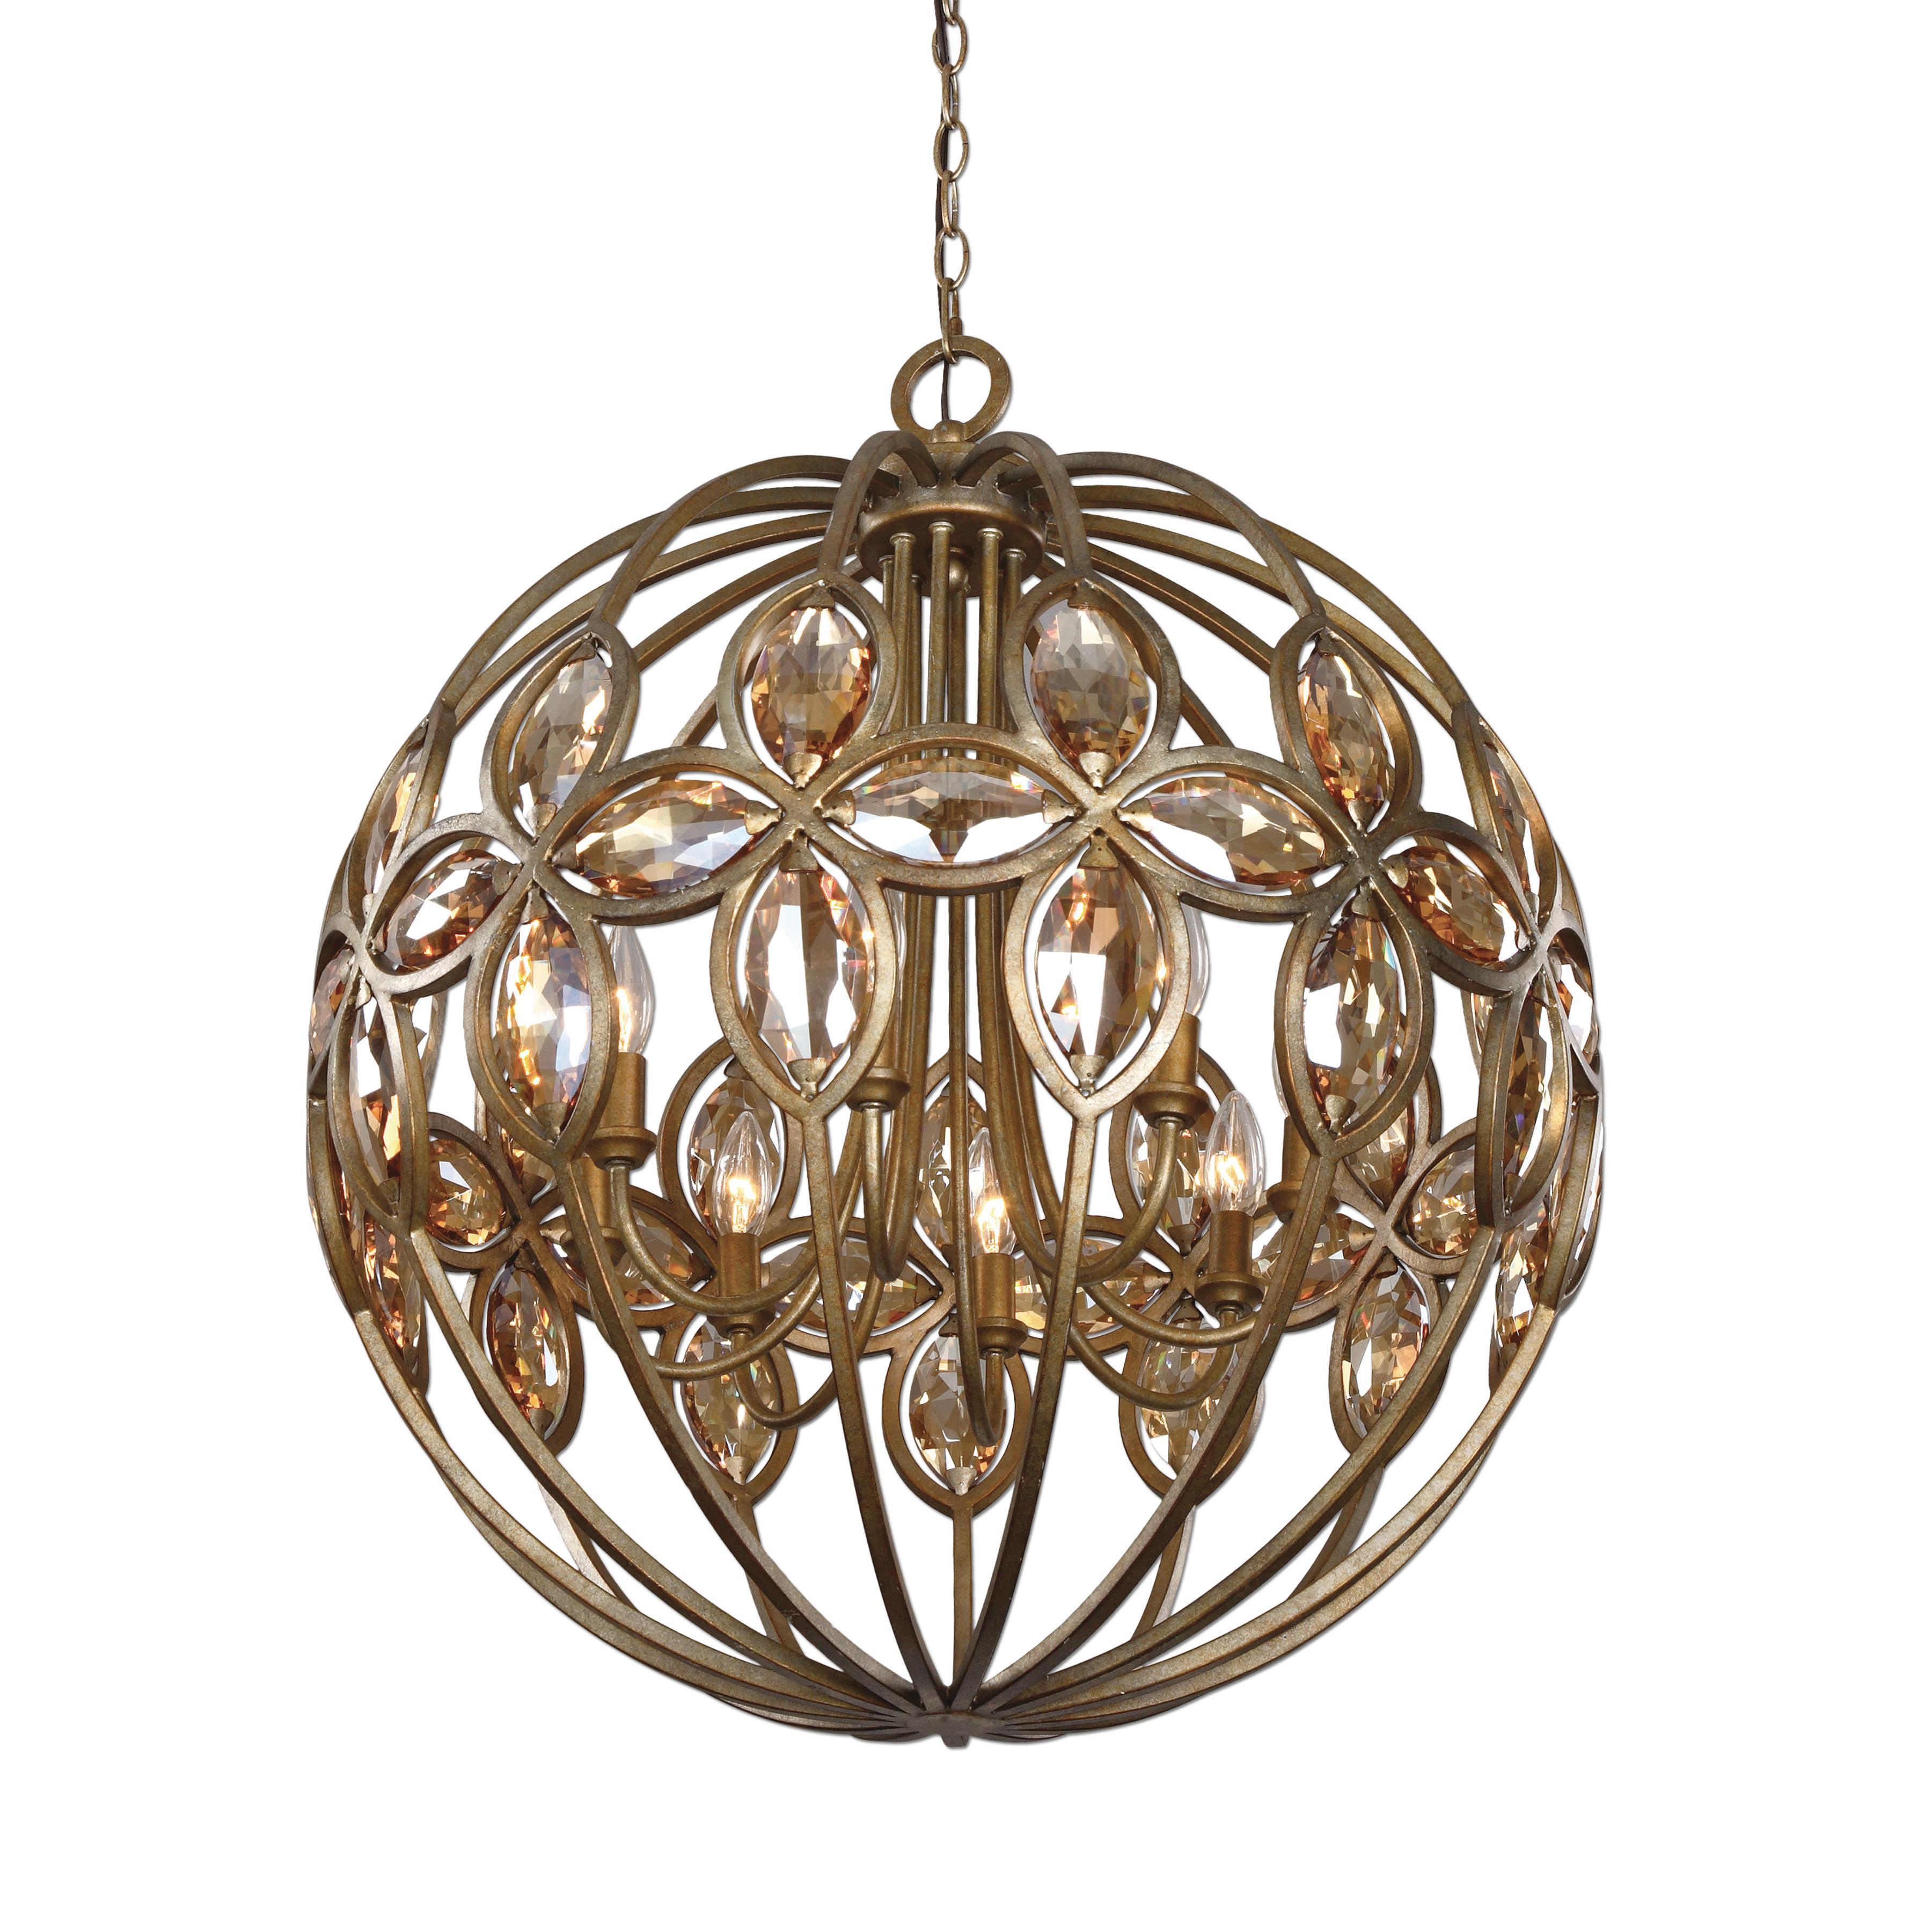 Uttermost Lighting Fixtures Ambre 8 Light Gold Sphere Chandelier - Item Number: 21269